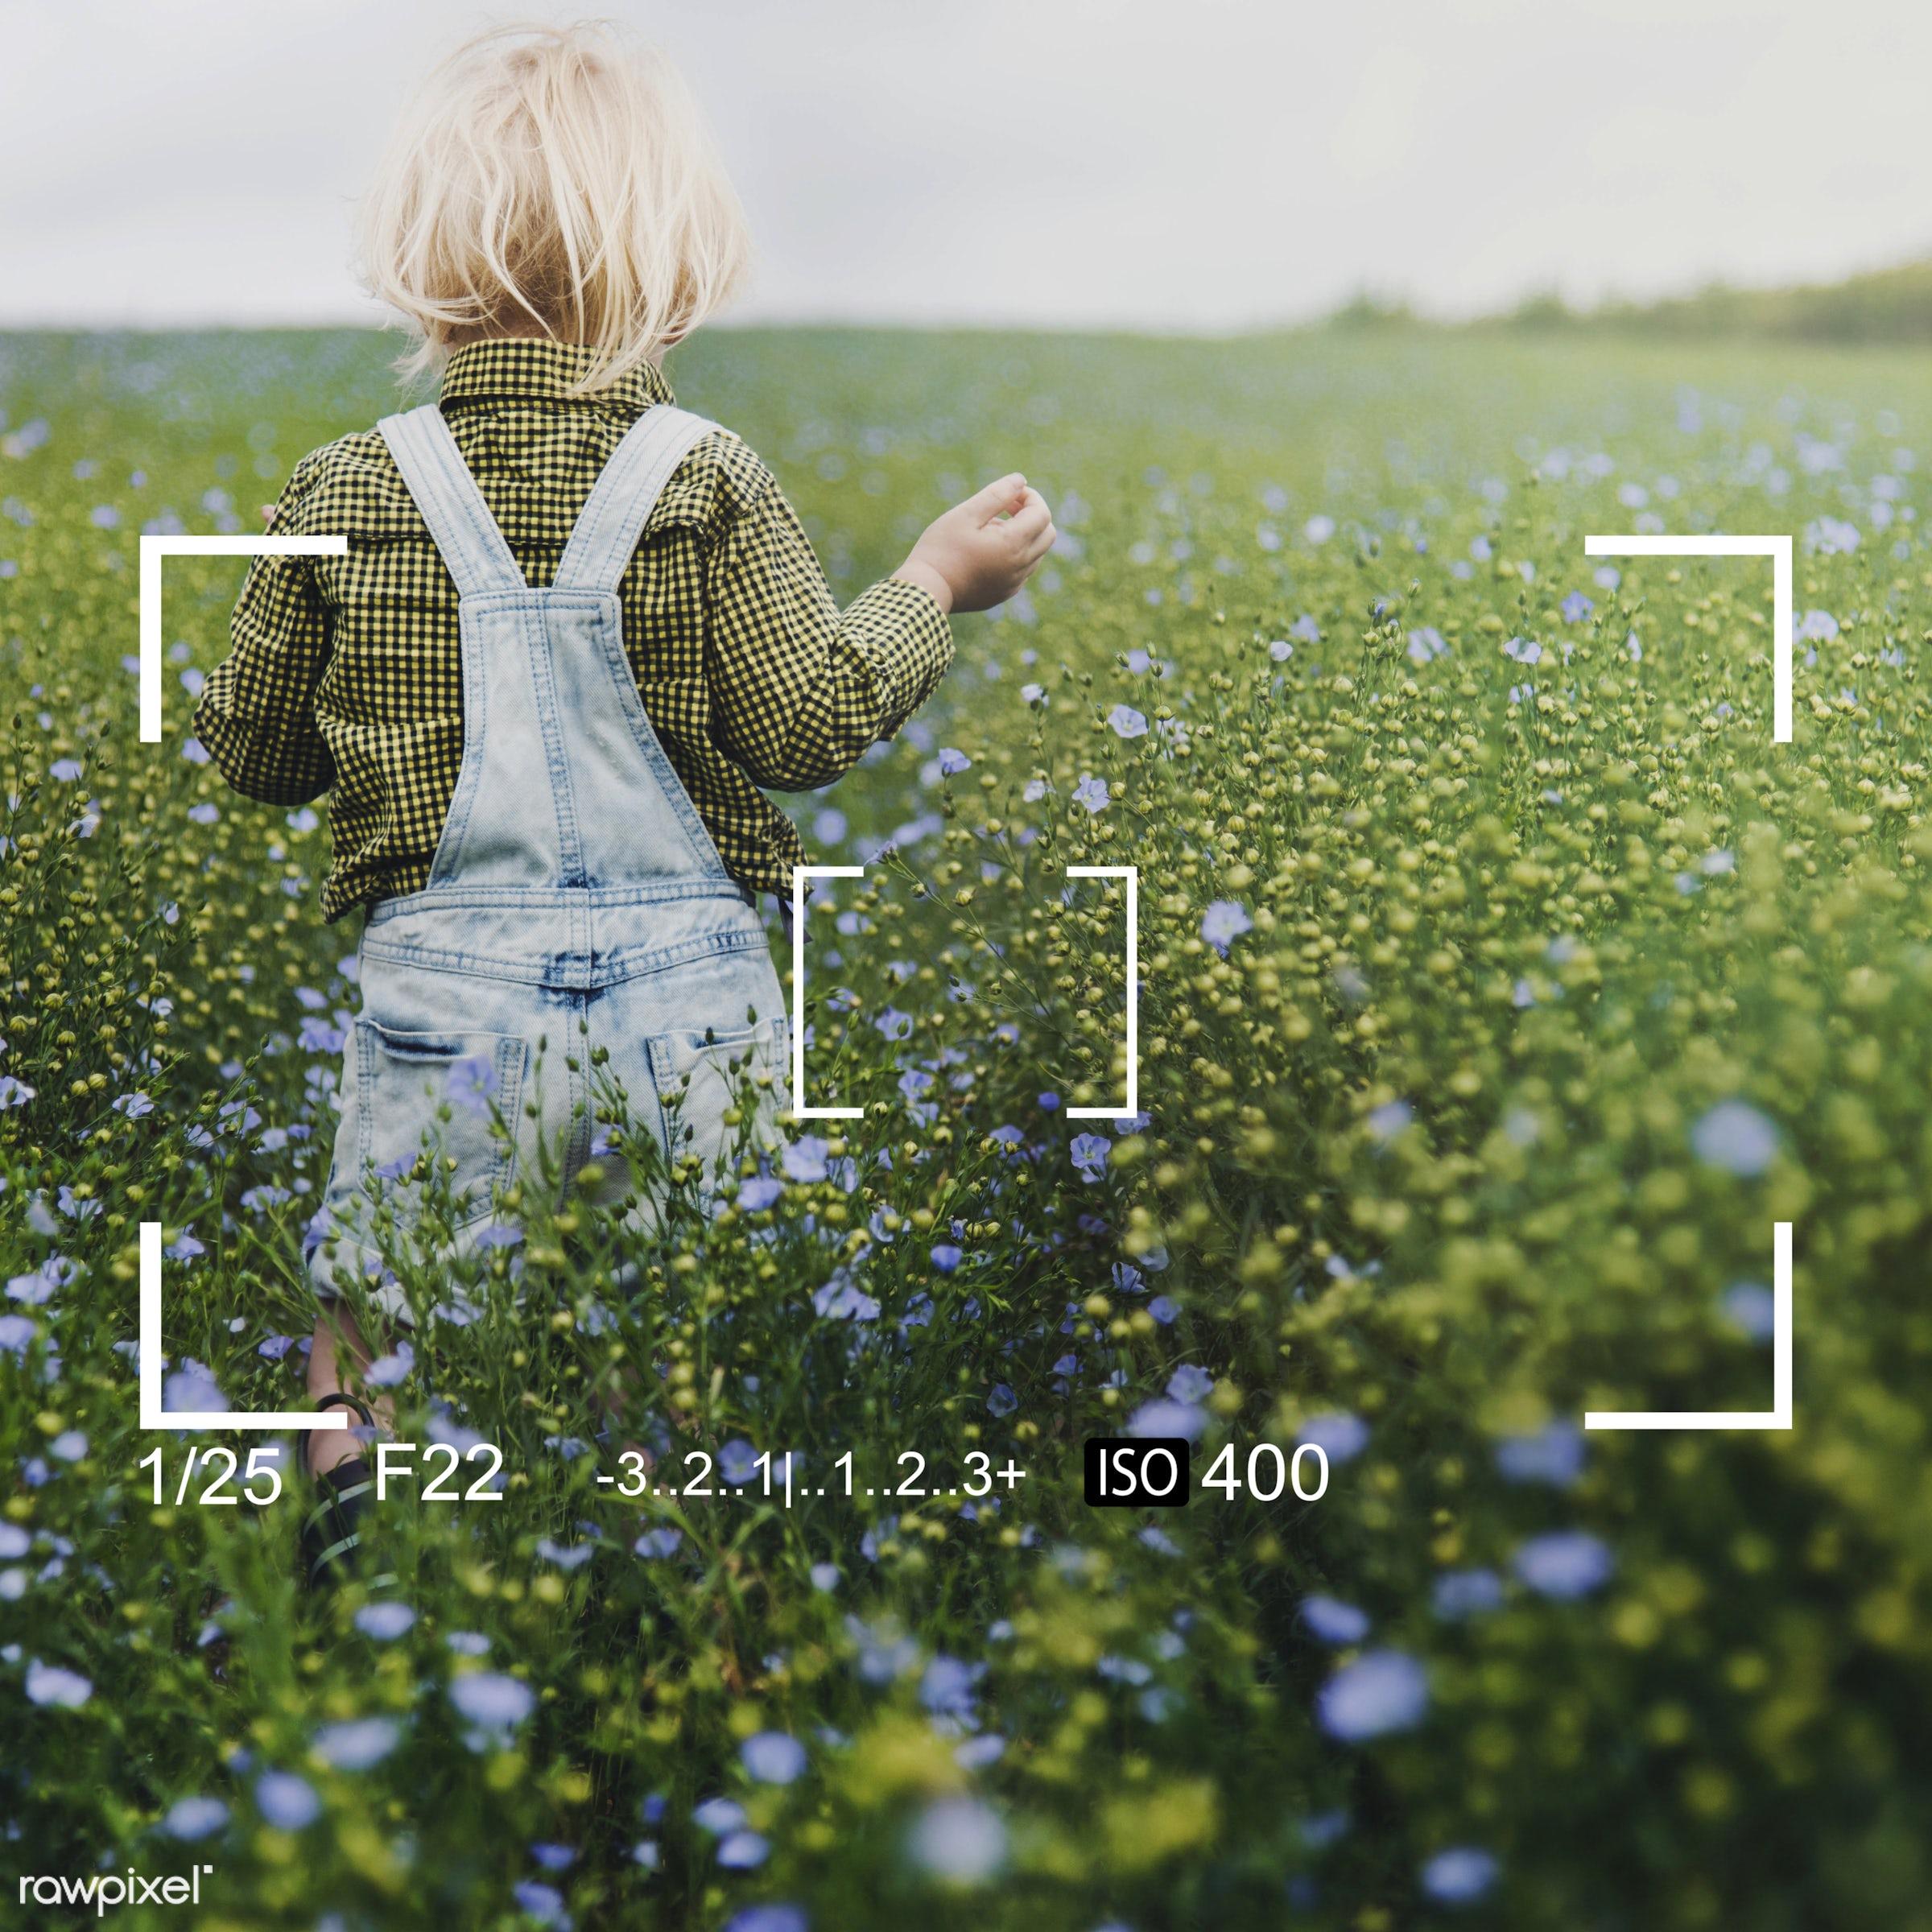 Kids and nature - badge, banner, blank, blonde, boy, camera, copy space, dungarees, flower garden, flowers, focus, garden,...